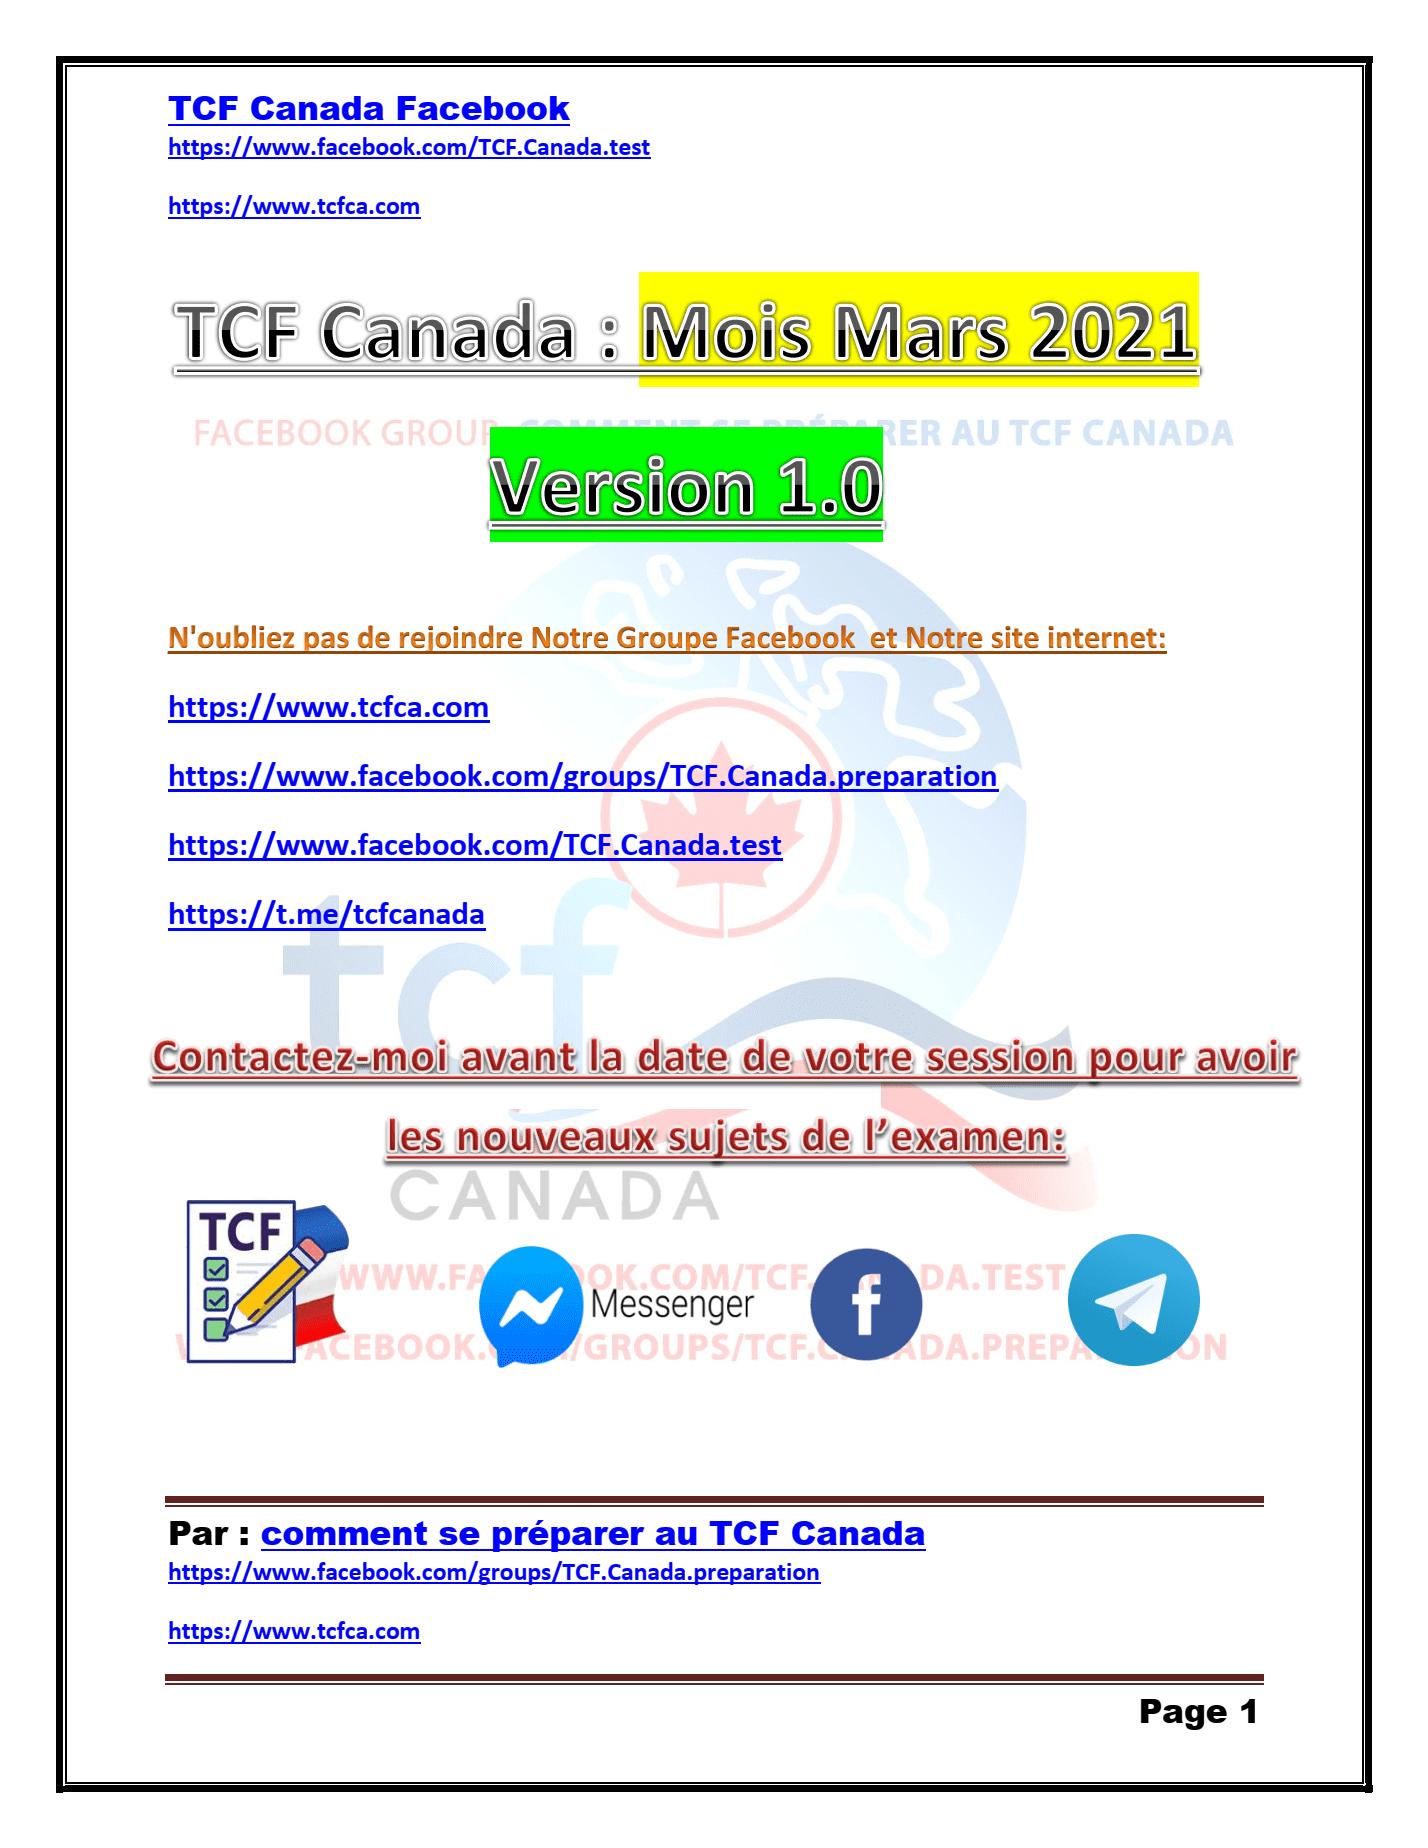 TCF Canada Expression orale Mars 2021